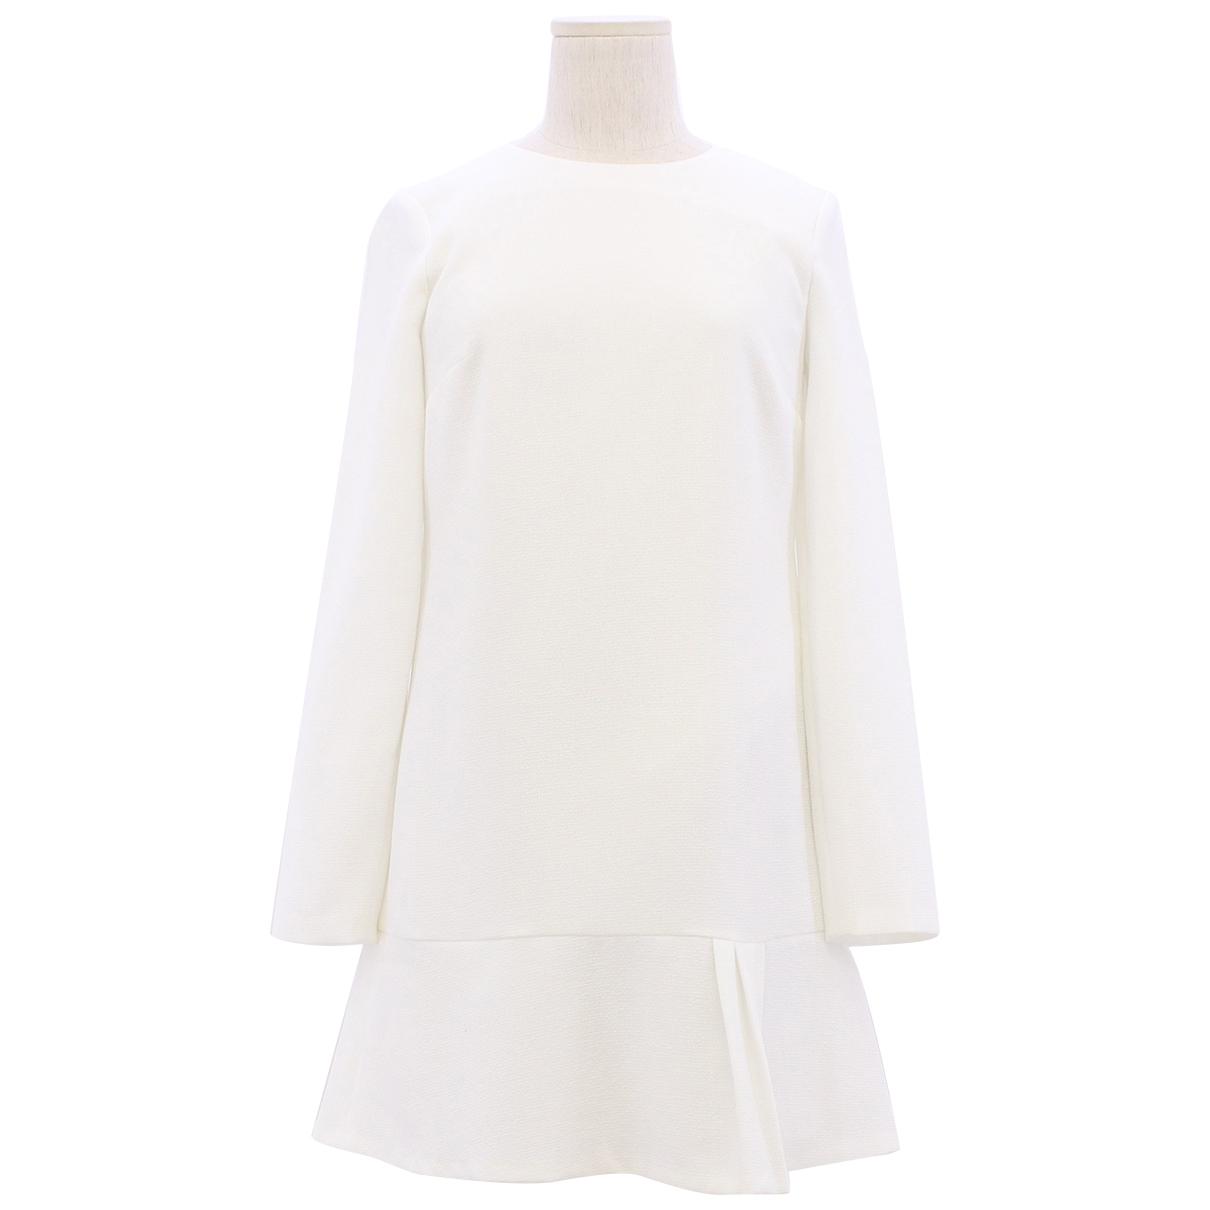 Club Monaco \N White dress for Women XS International